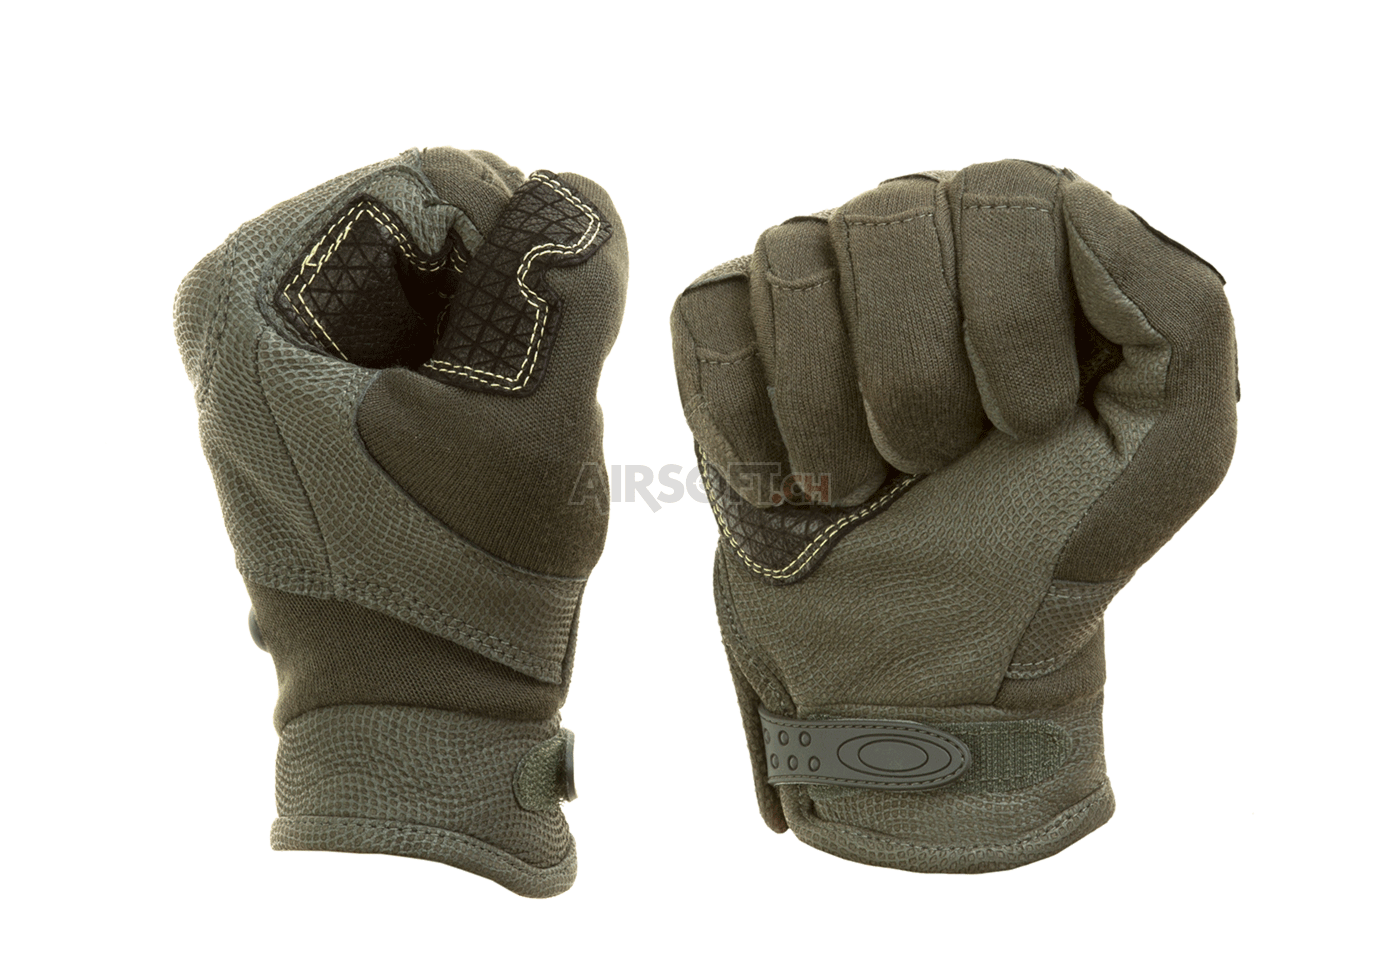 FR Fast Rope Gloves Foliage Green (Oakley) M - Abseilhandschuhe -  Handschuhe - Bekleidung - airsoft.ch Onlineshop ba042219145e